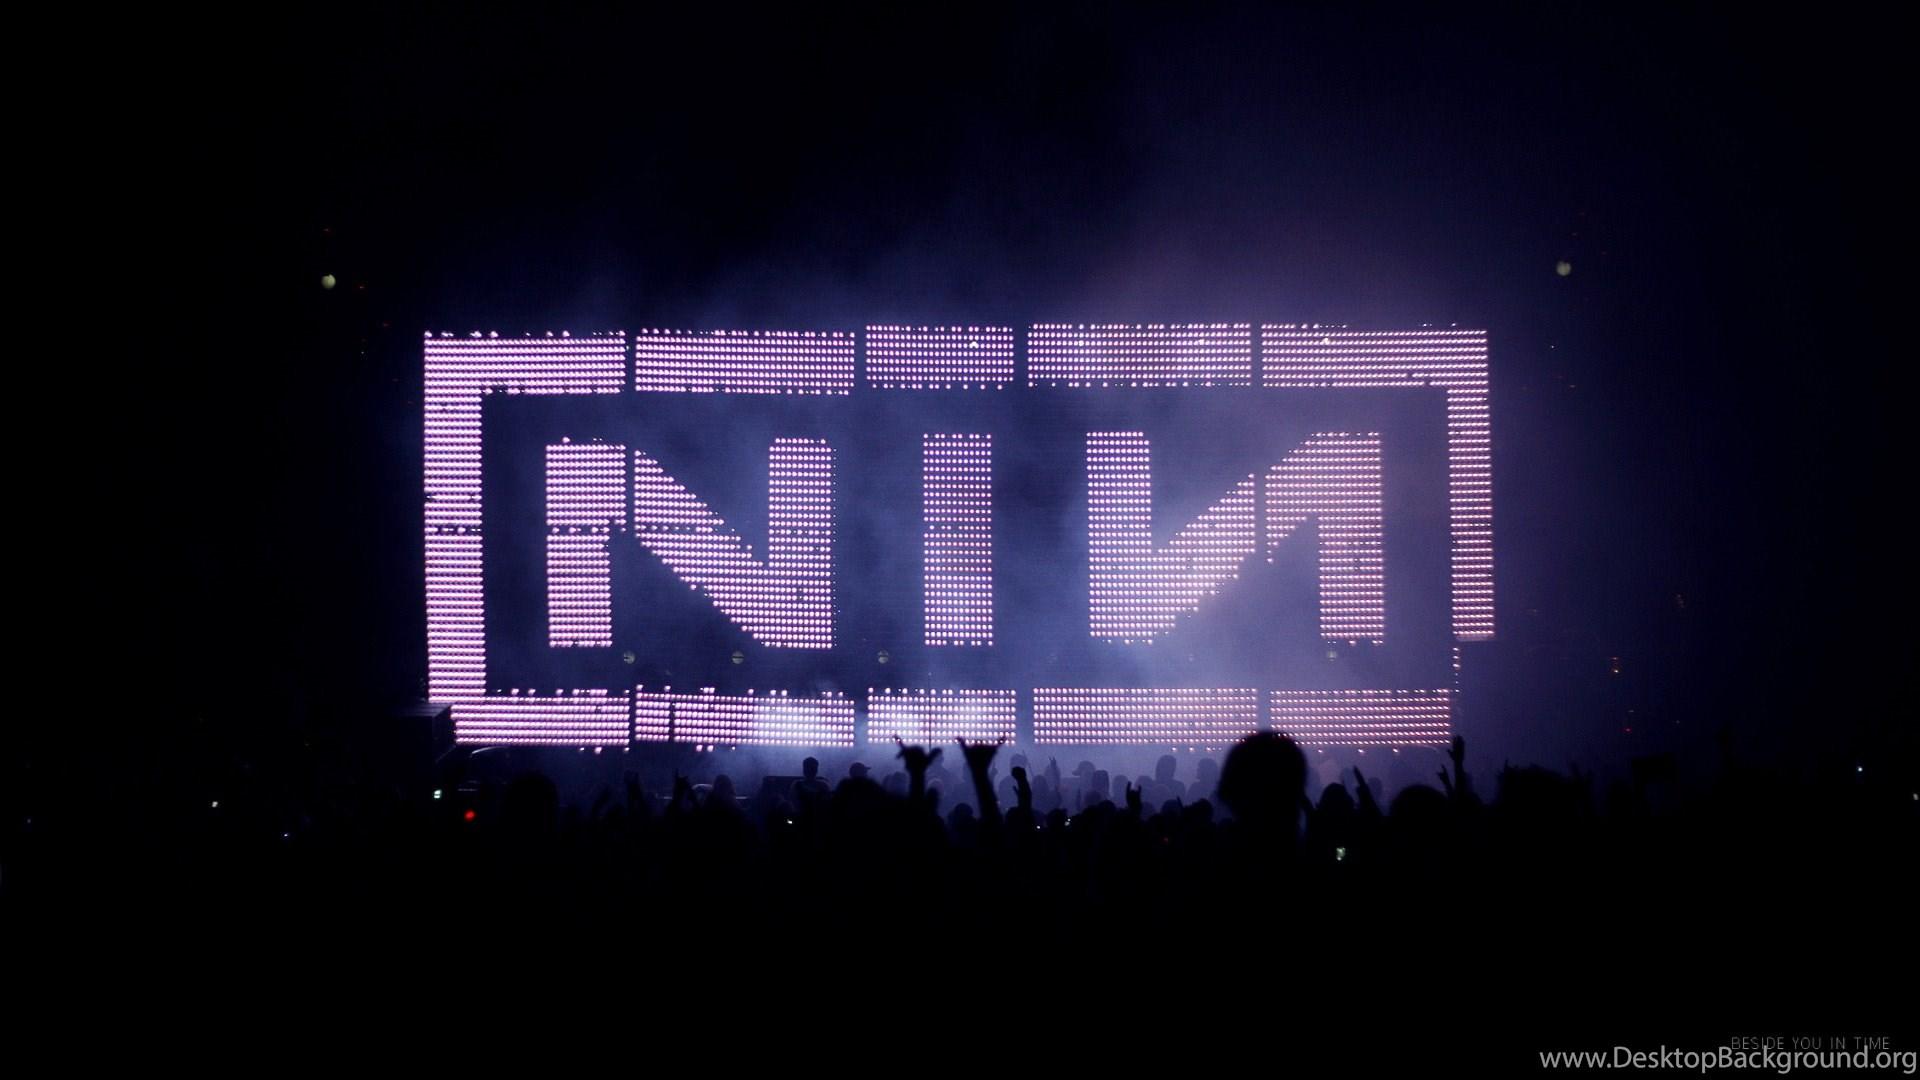 Nine Inch Nails Beside You In Time [wallpaper] Desktop Background